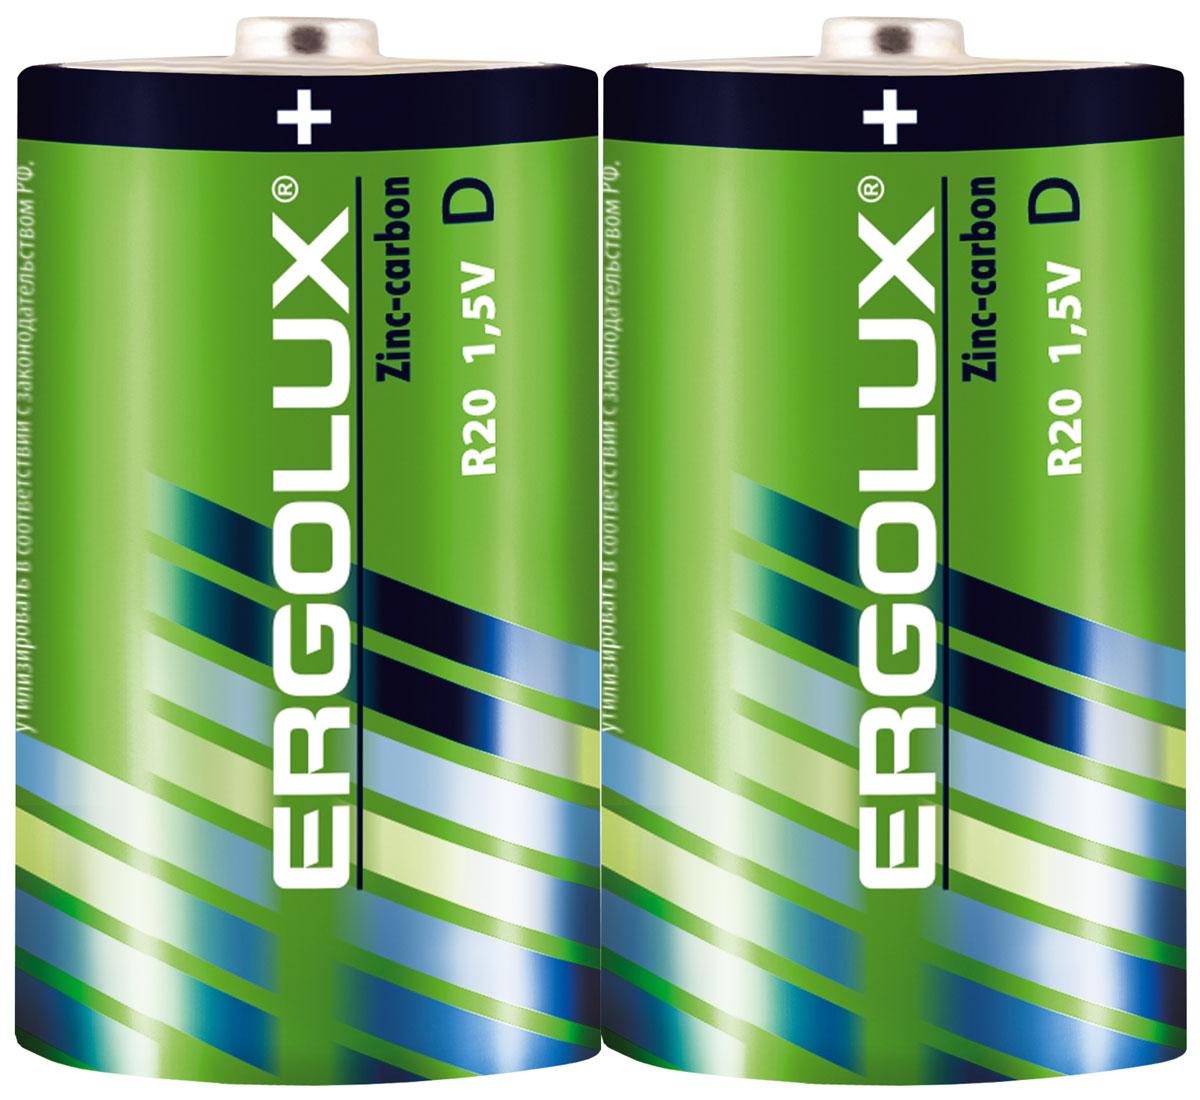 Батарейка Ergolux R20 SR2 батарейка аккумуляторная ergolux nimh тип аа 1500 mah